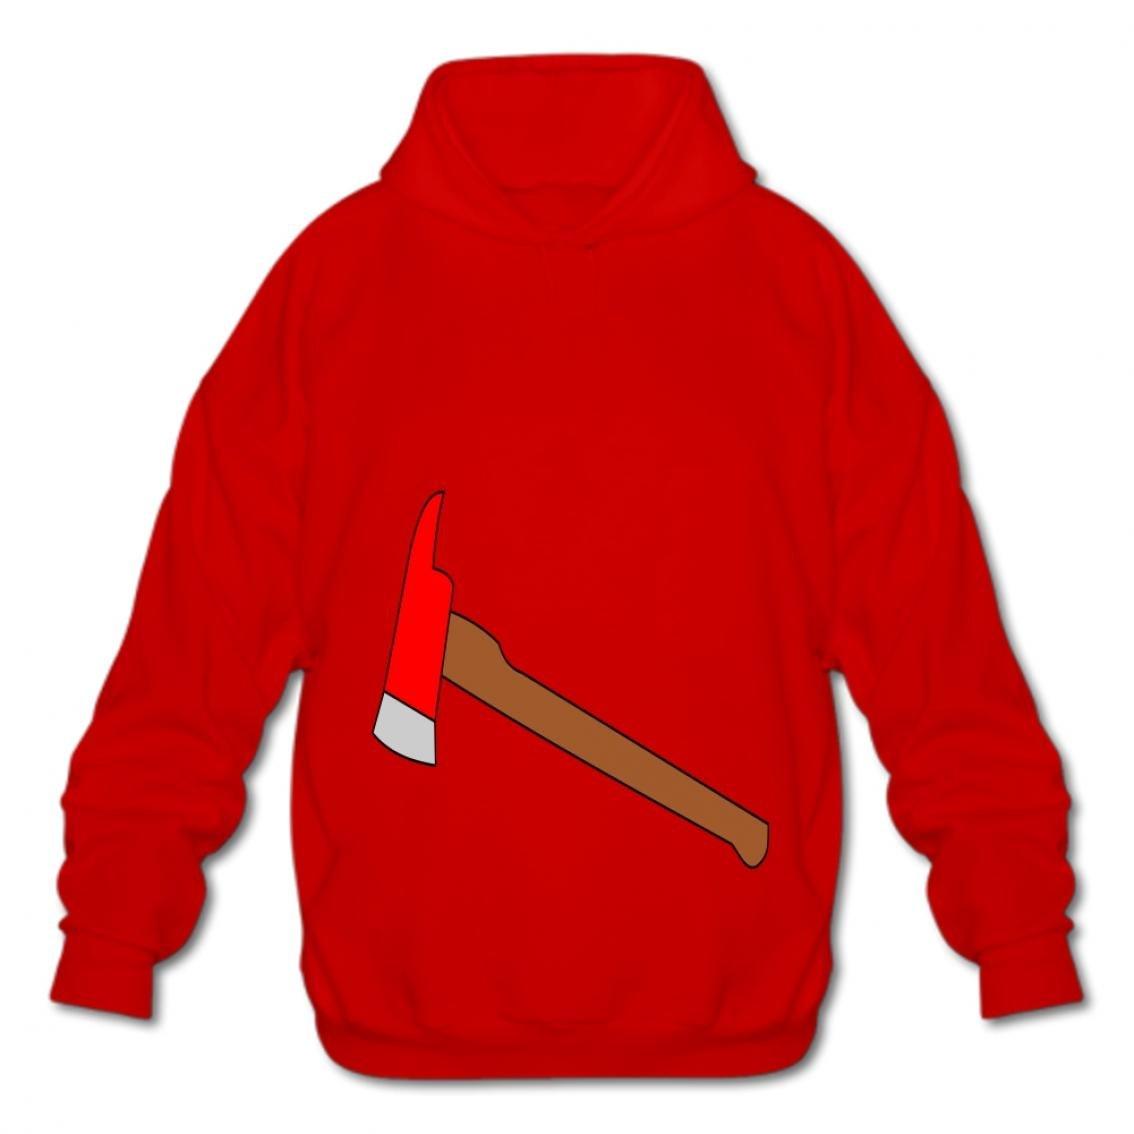 Euochengqus Hooded Fashion Hoodies-03 Cartoon Fire vnwt Cotton Pullover Sweatshirts Fashion Mens